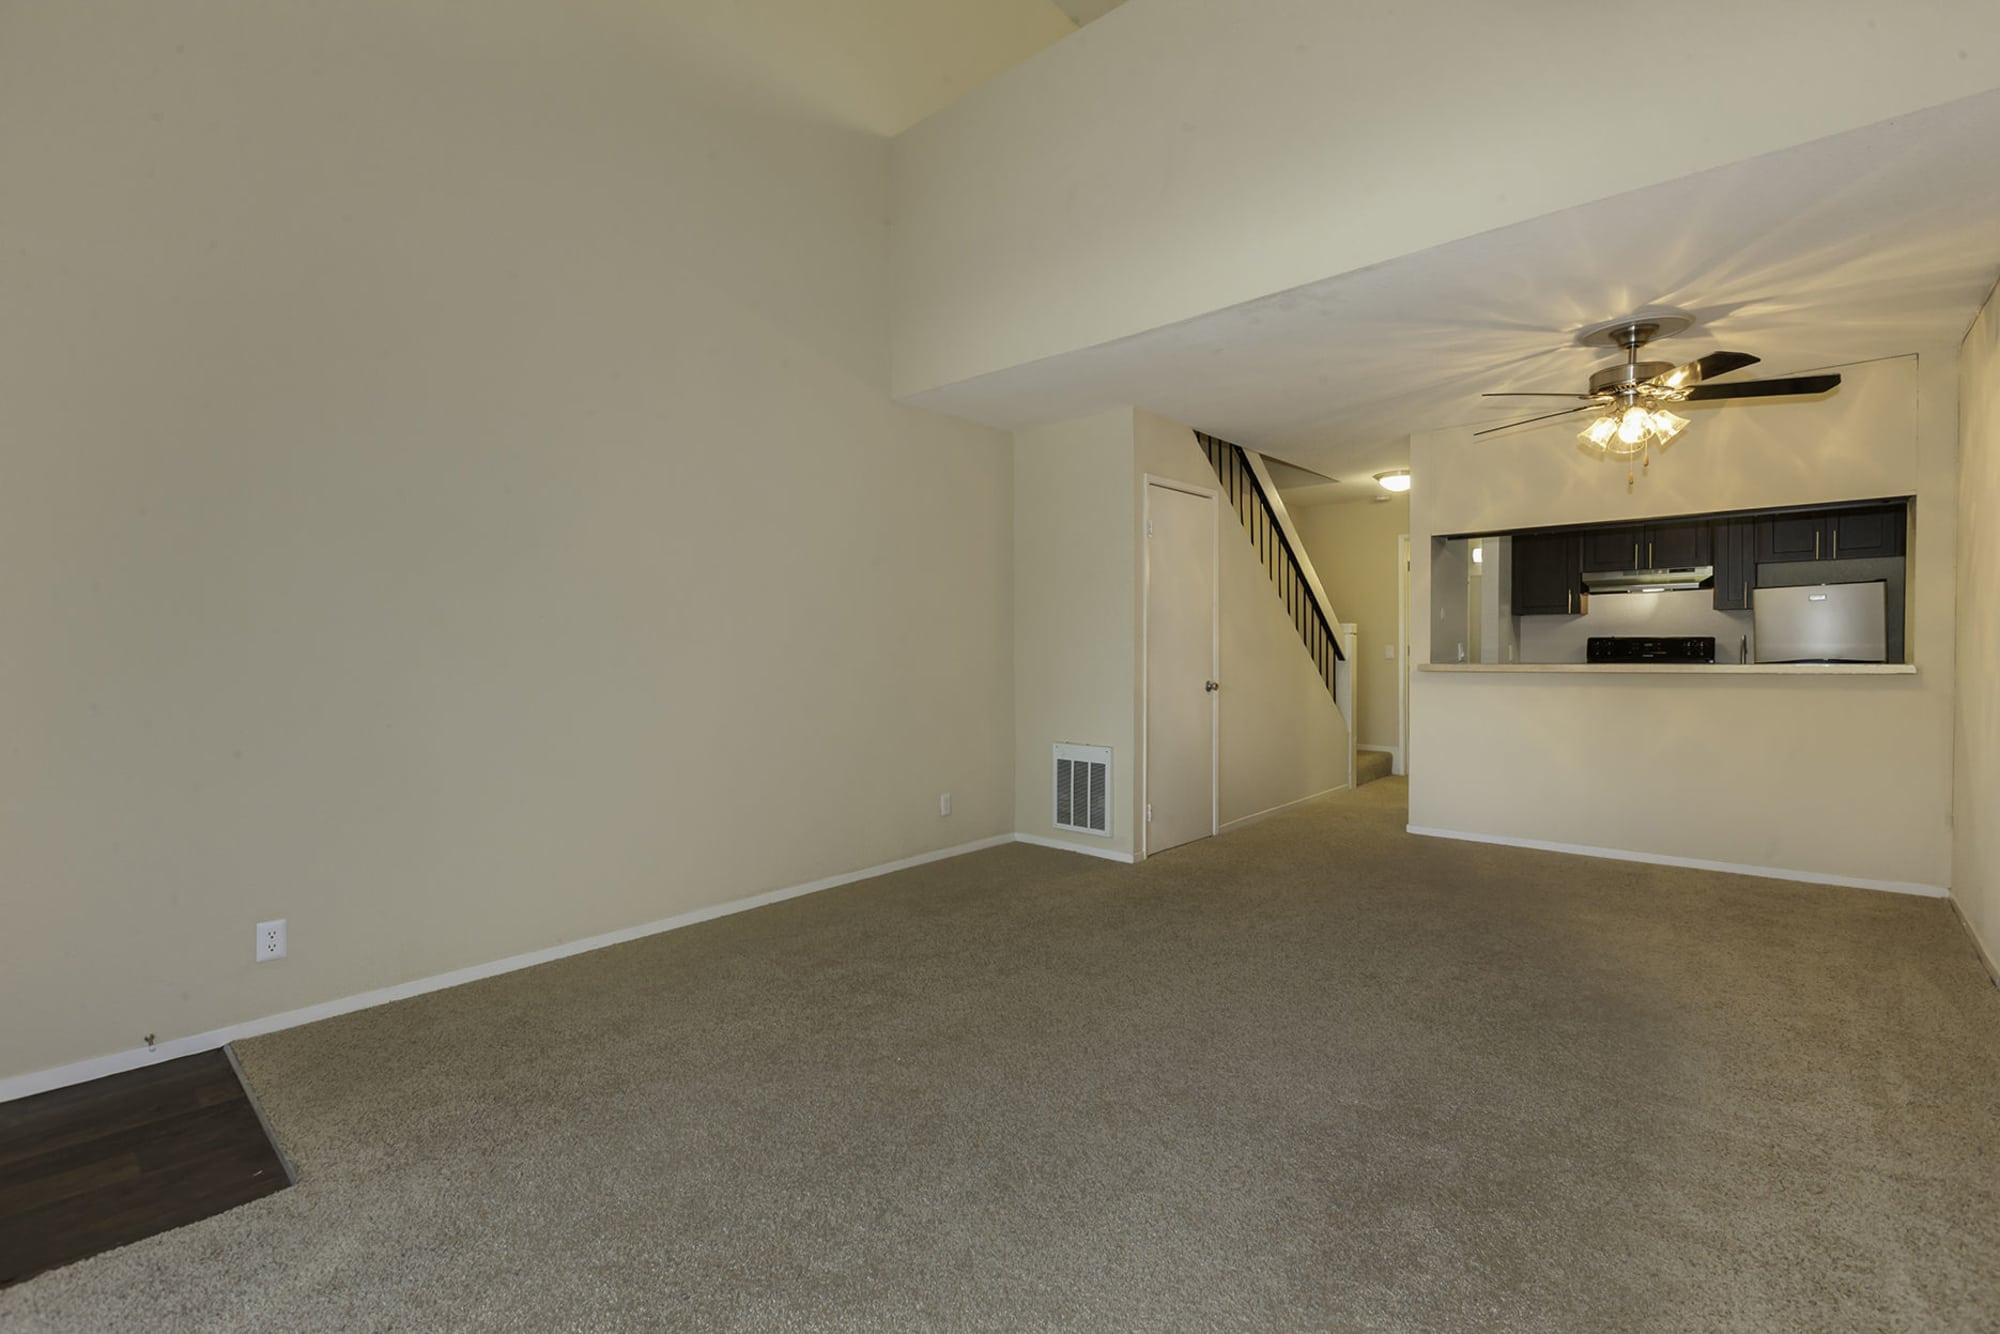 Open floor plan view of living room in Hayward, CA offer a living room